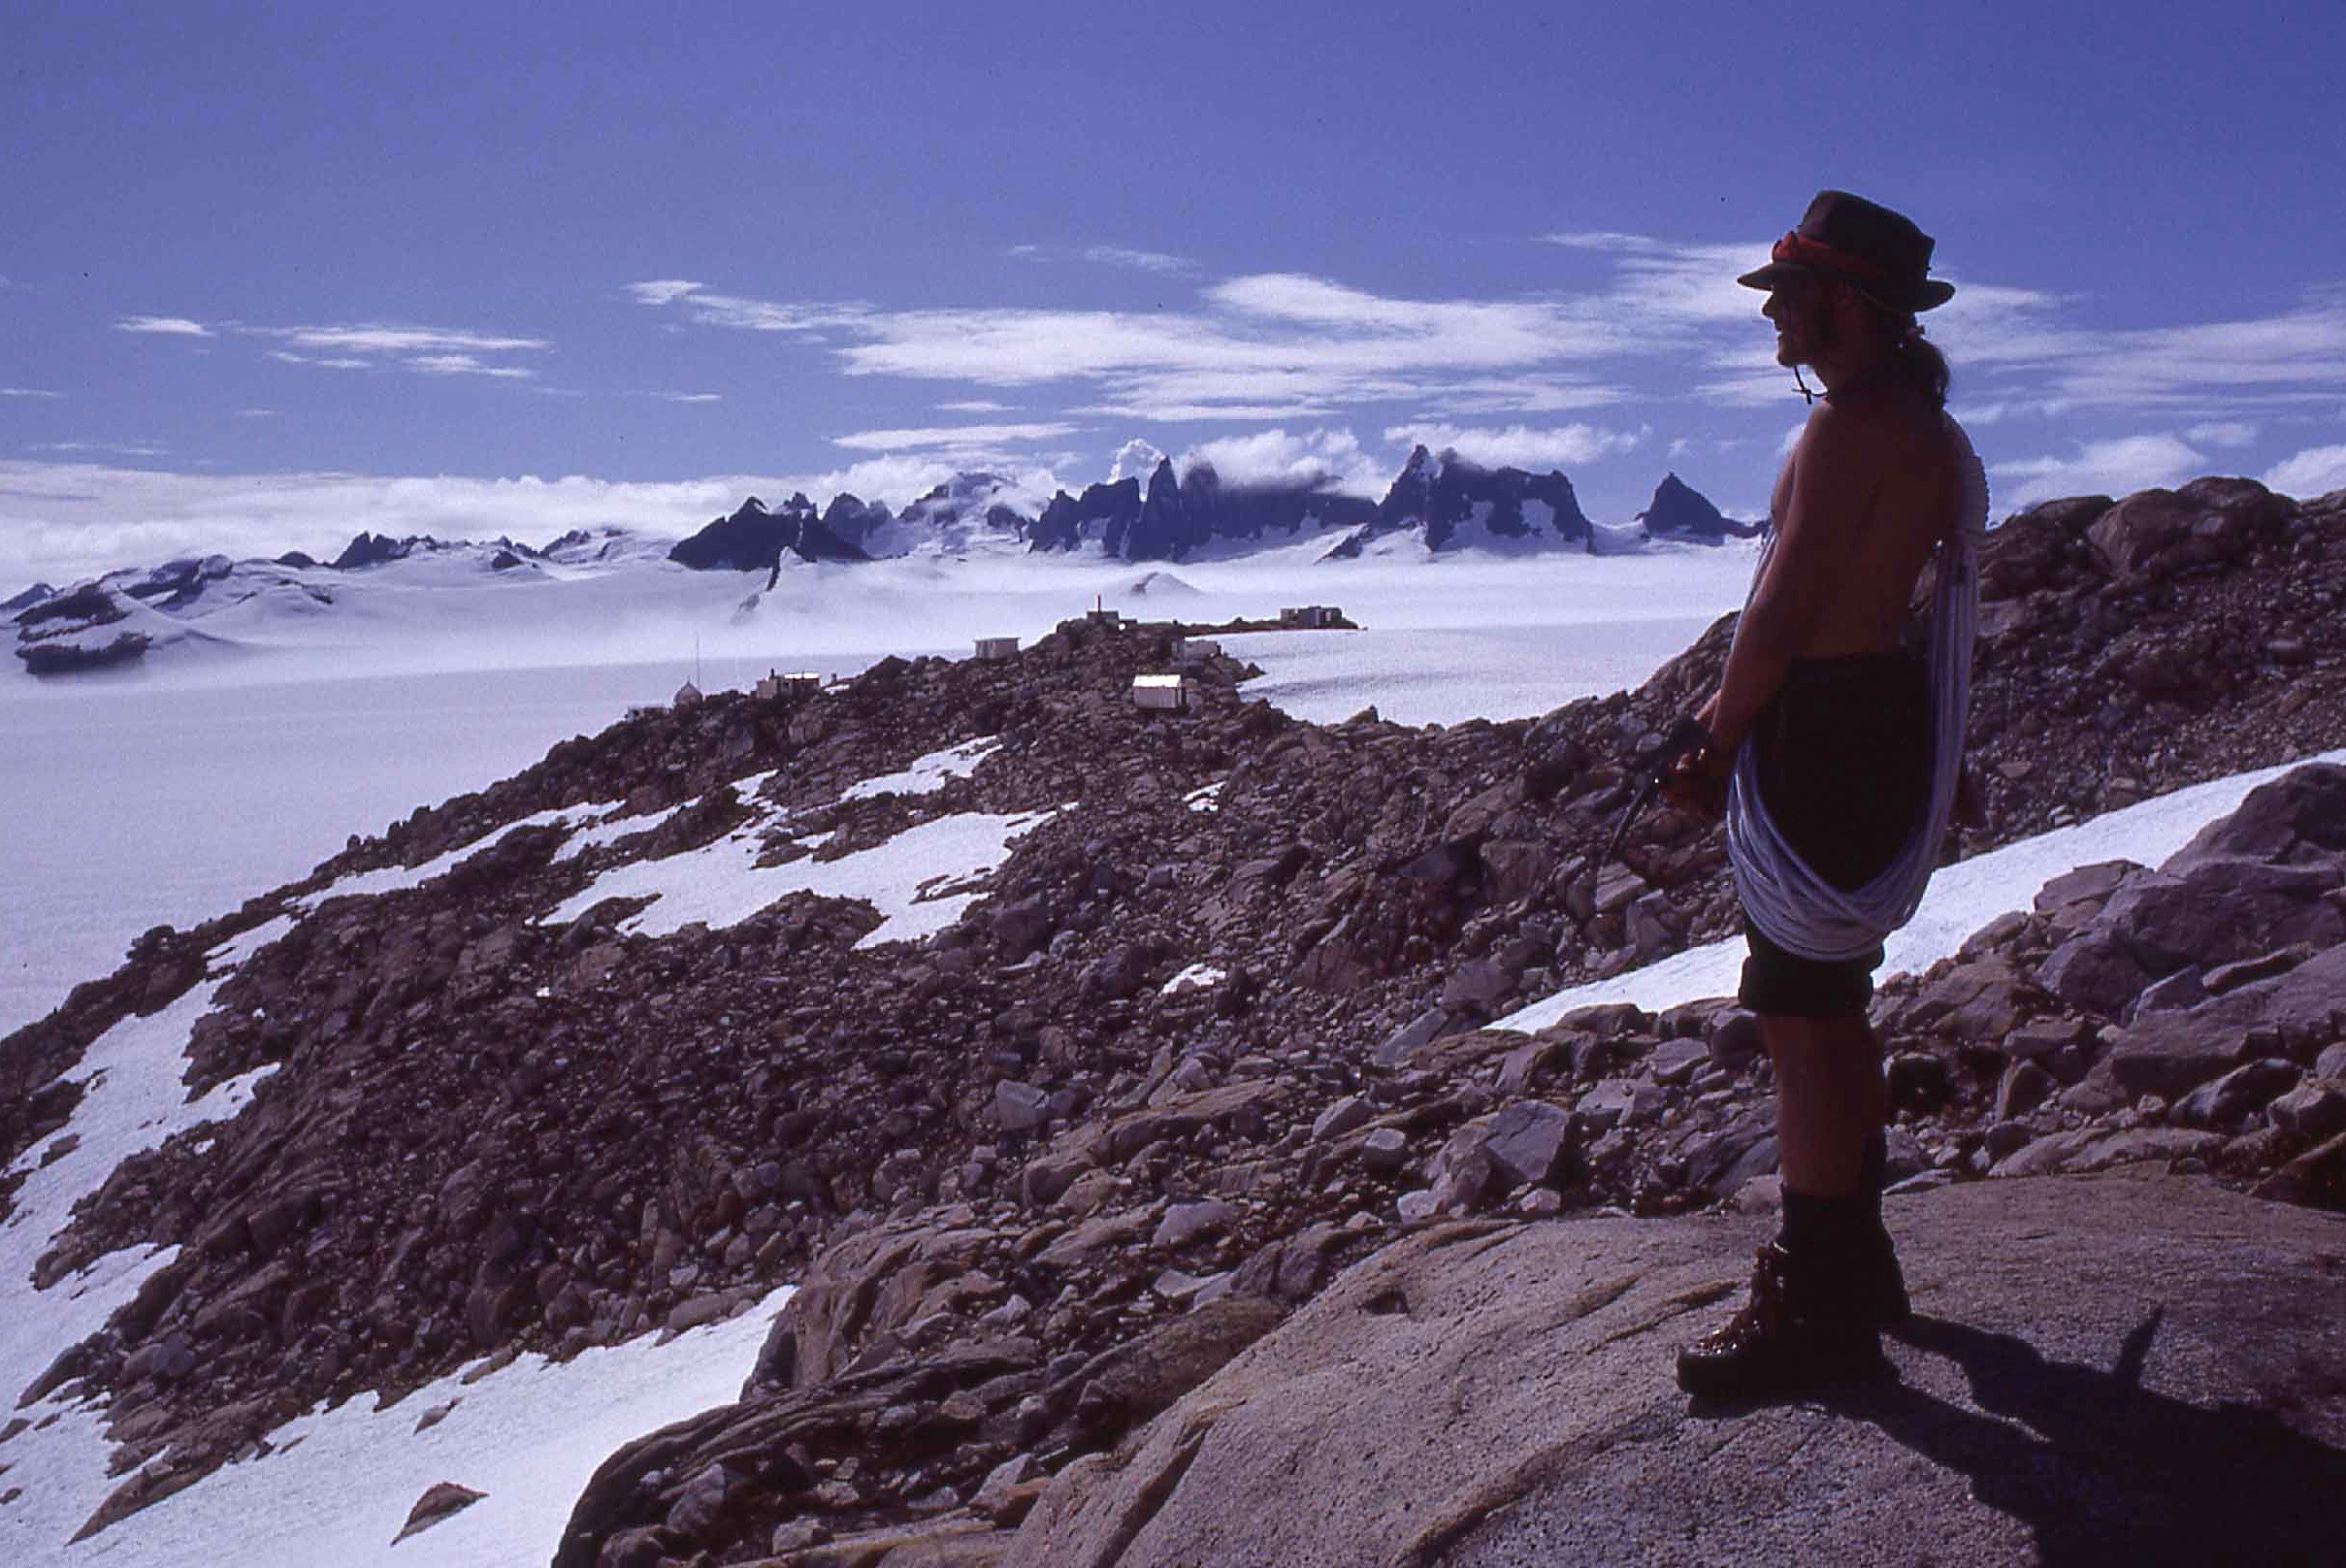 [name unknown], Camp 10, Taku Glacier, 1980